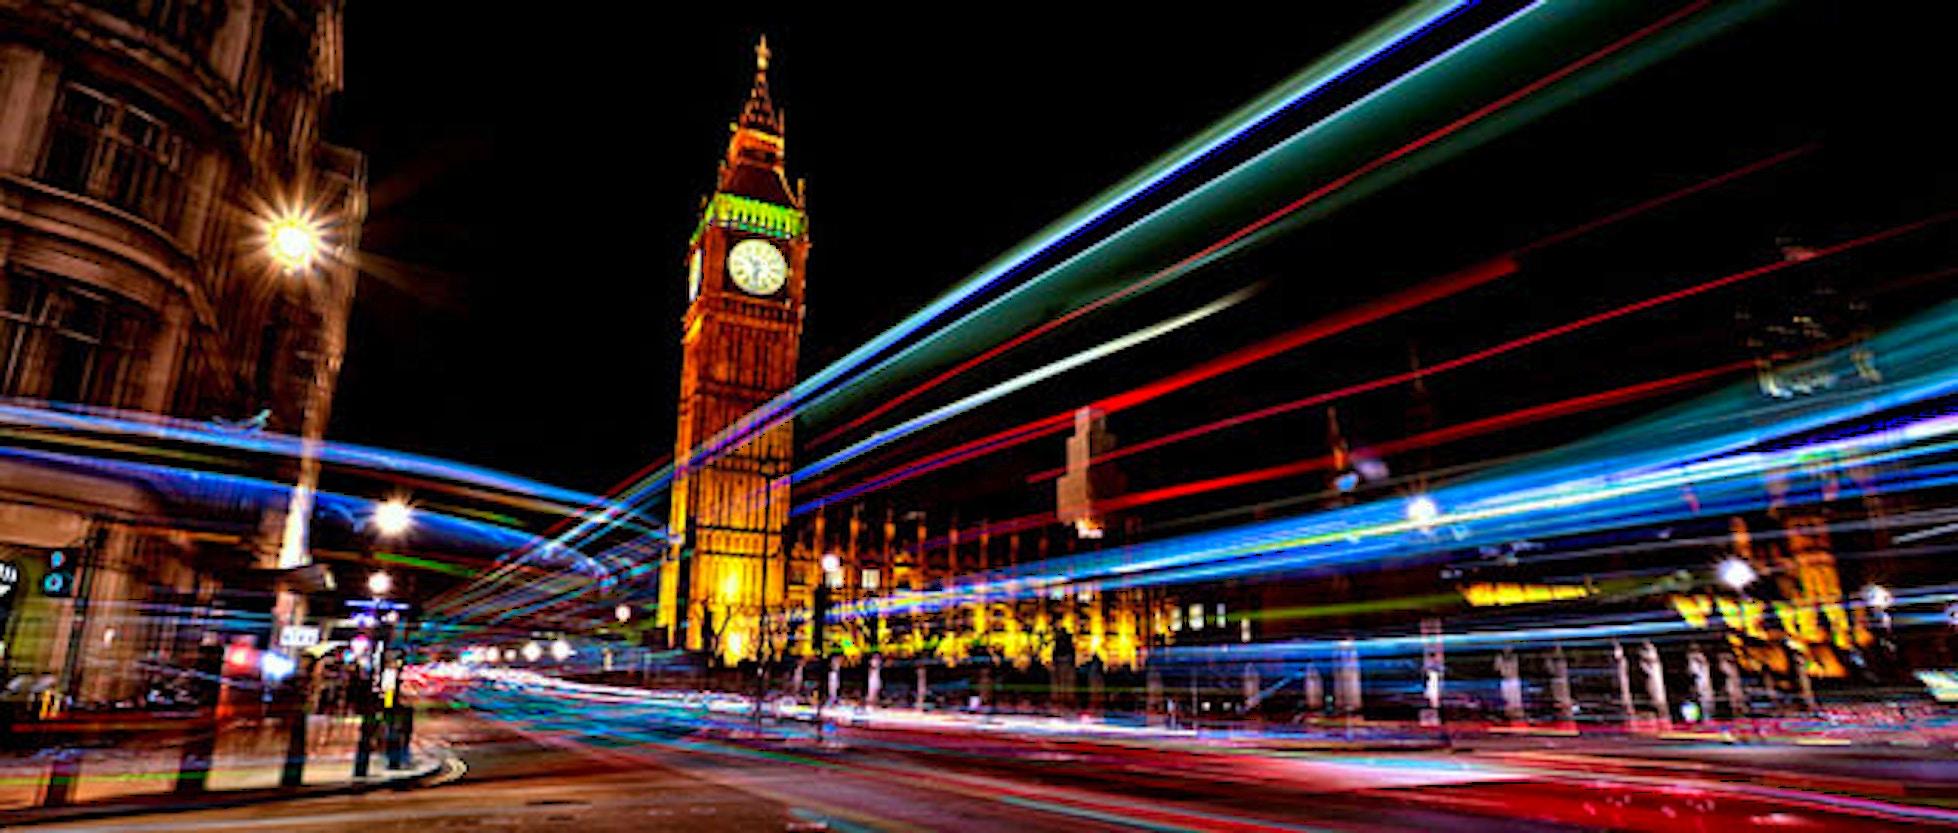 Londra Low Cost, mission impossible? | VIVI LONDRA